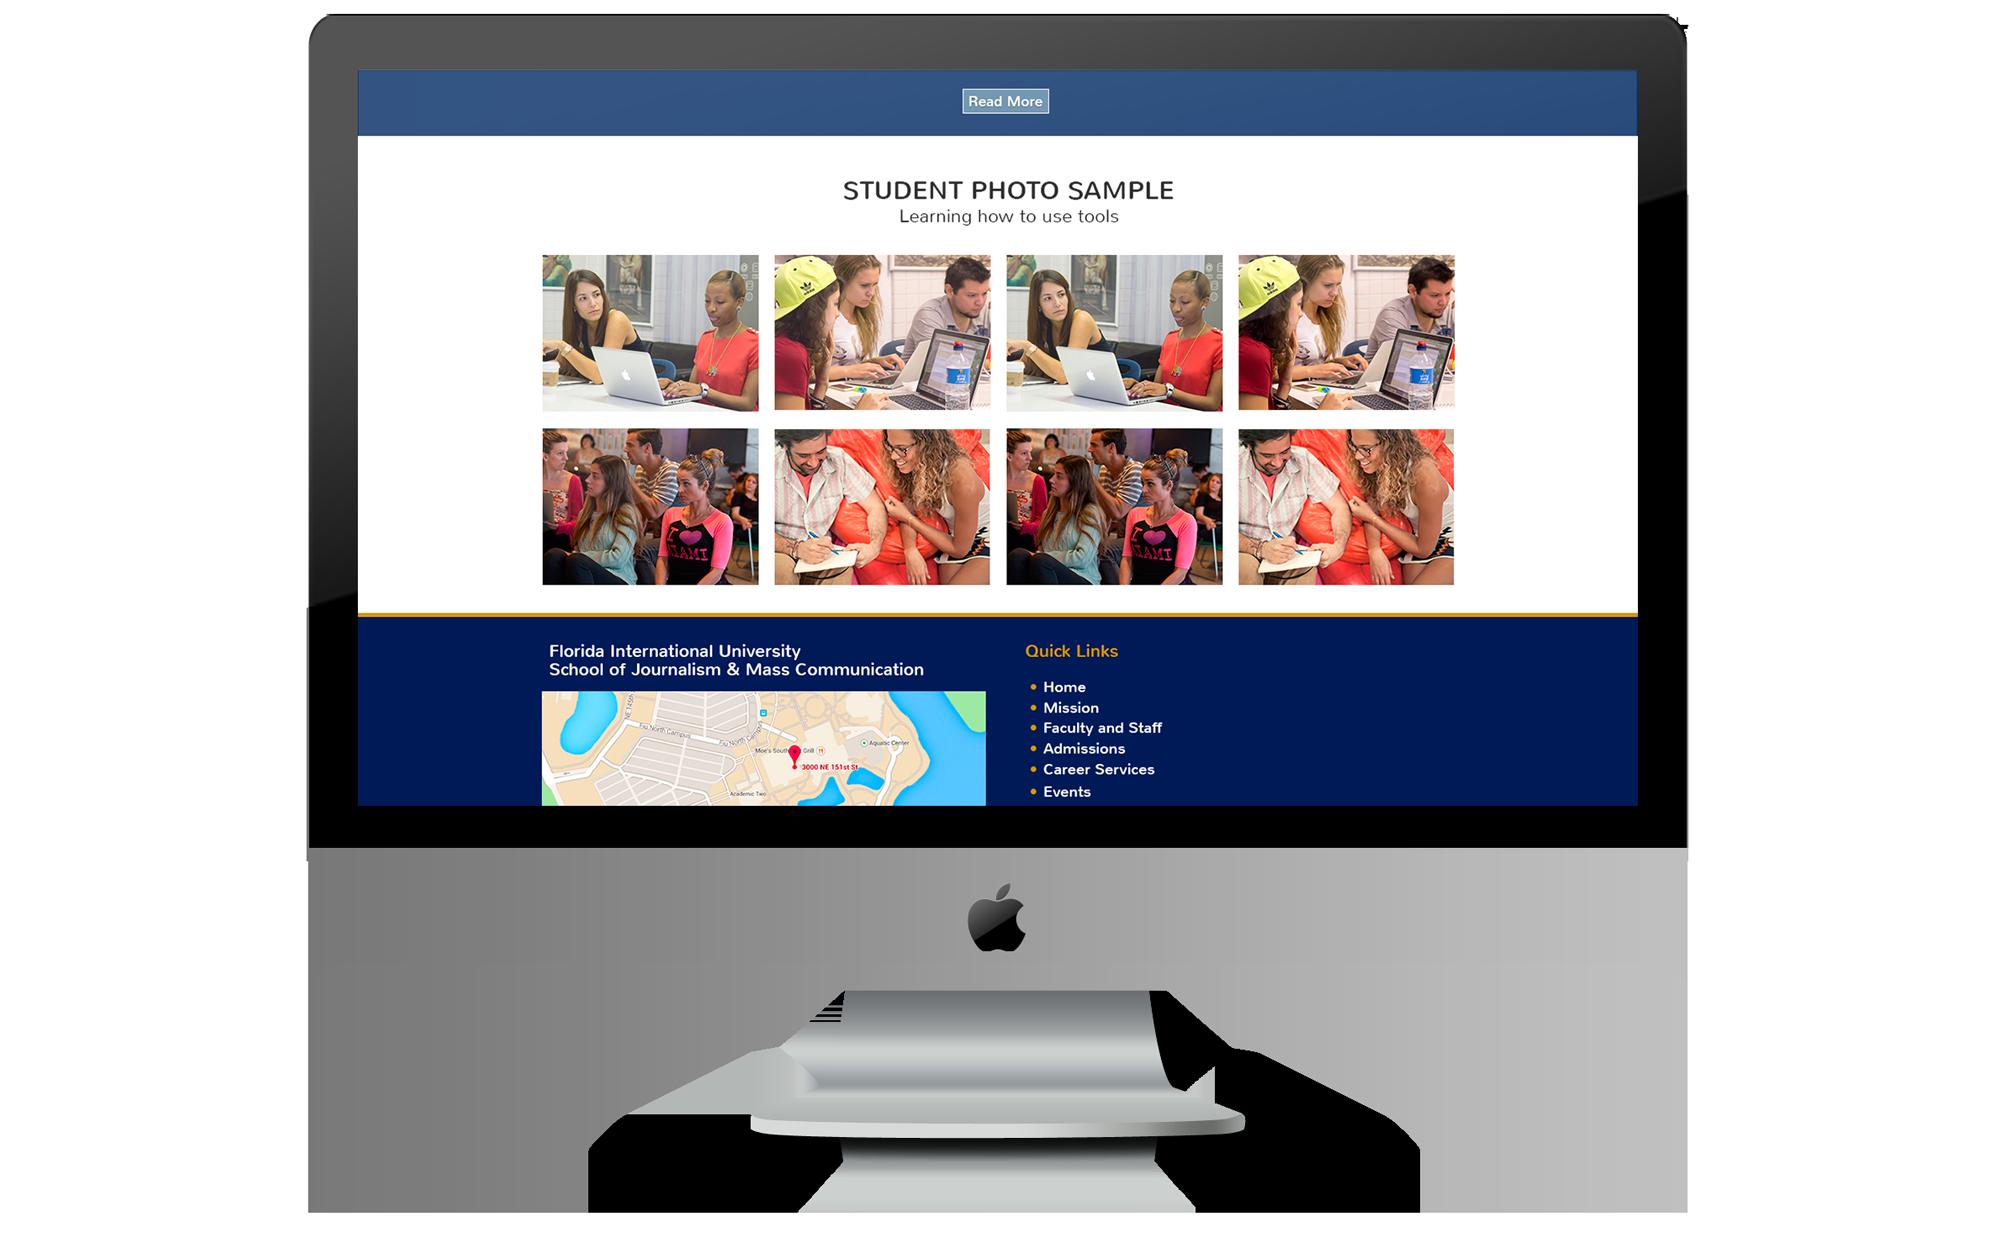 fiu-website-imac-mockup-DEFAULT-3.png